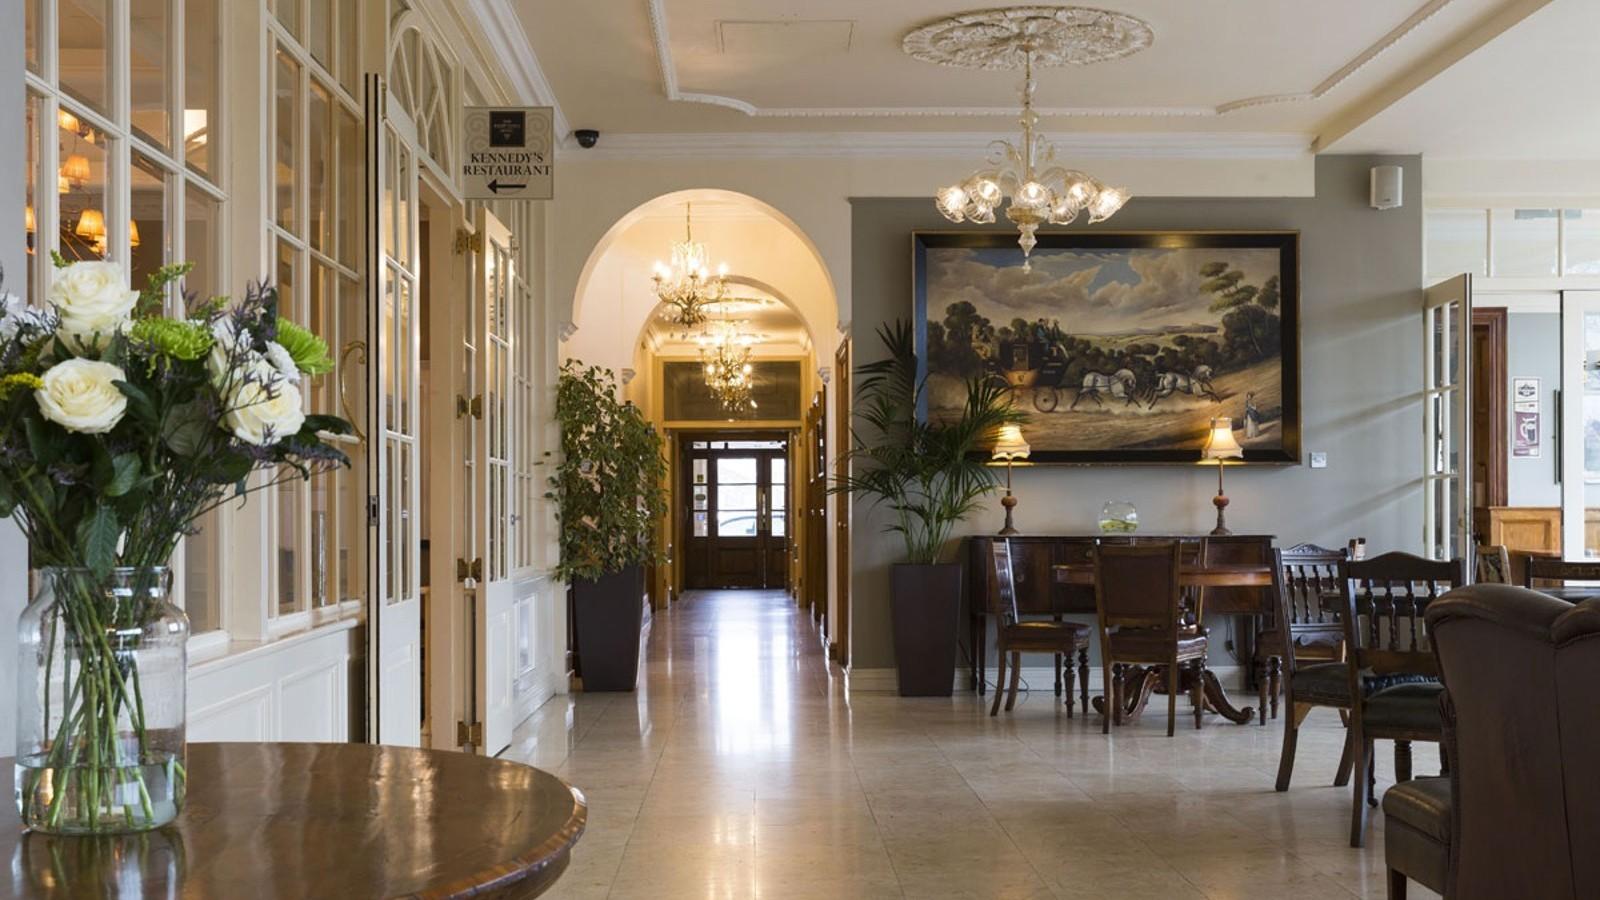 west cork hotel | hotels in west cork | skibbereen hotel